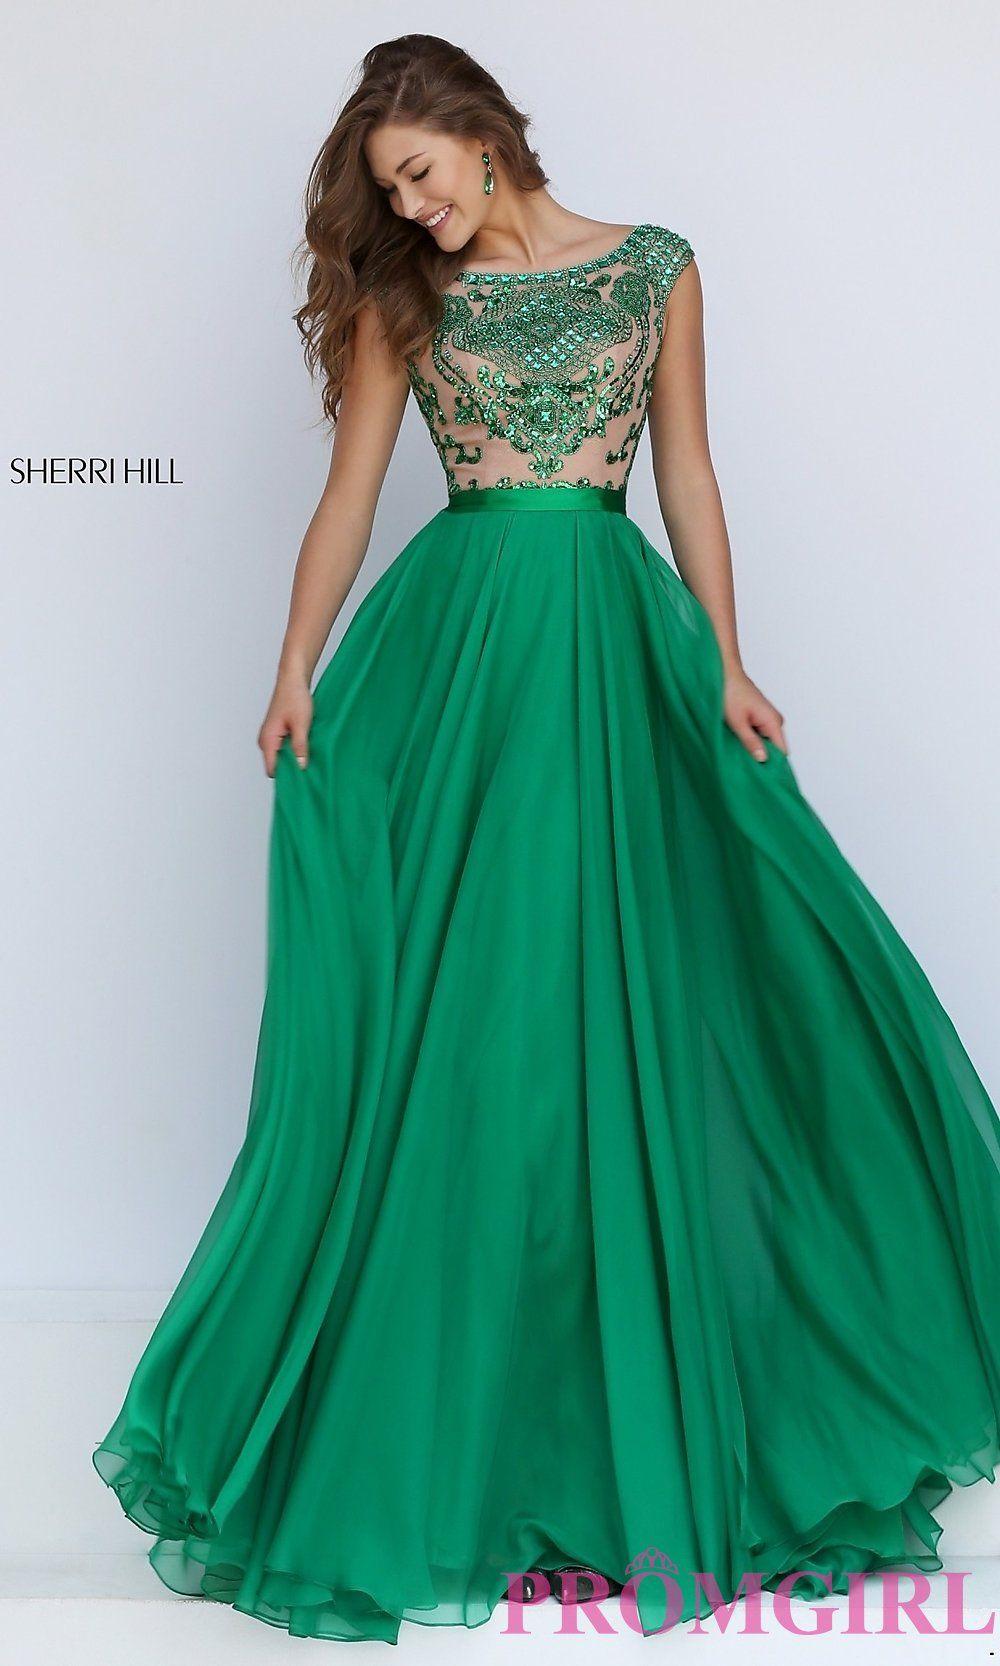 Green Emerald prom dress sherri hill pictures fotos